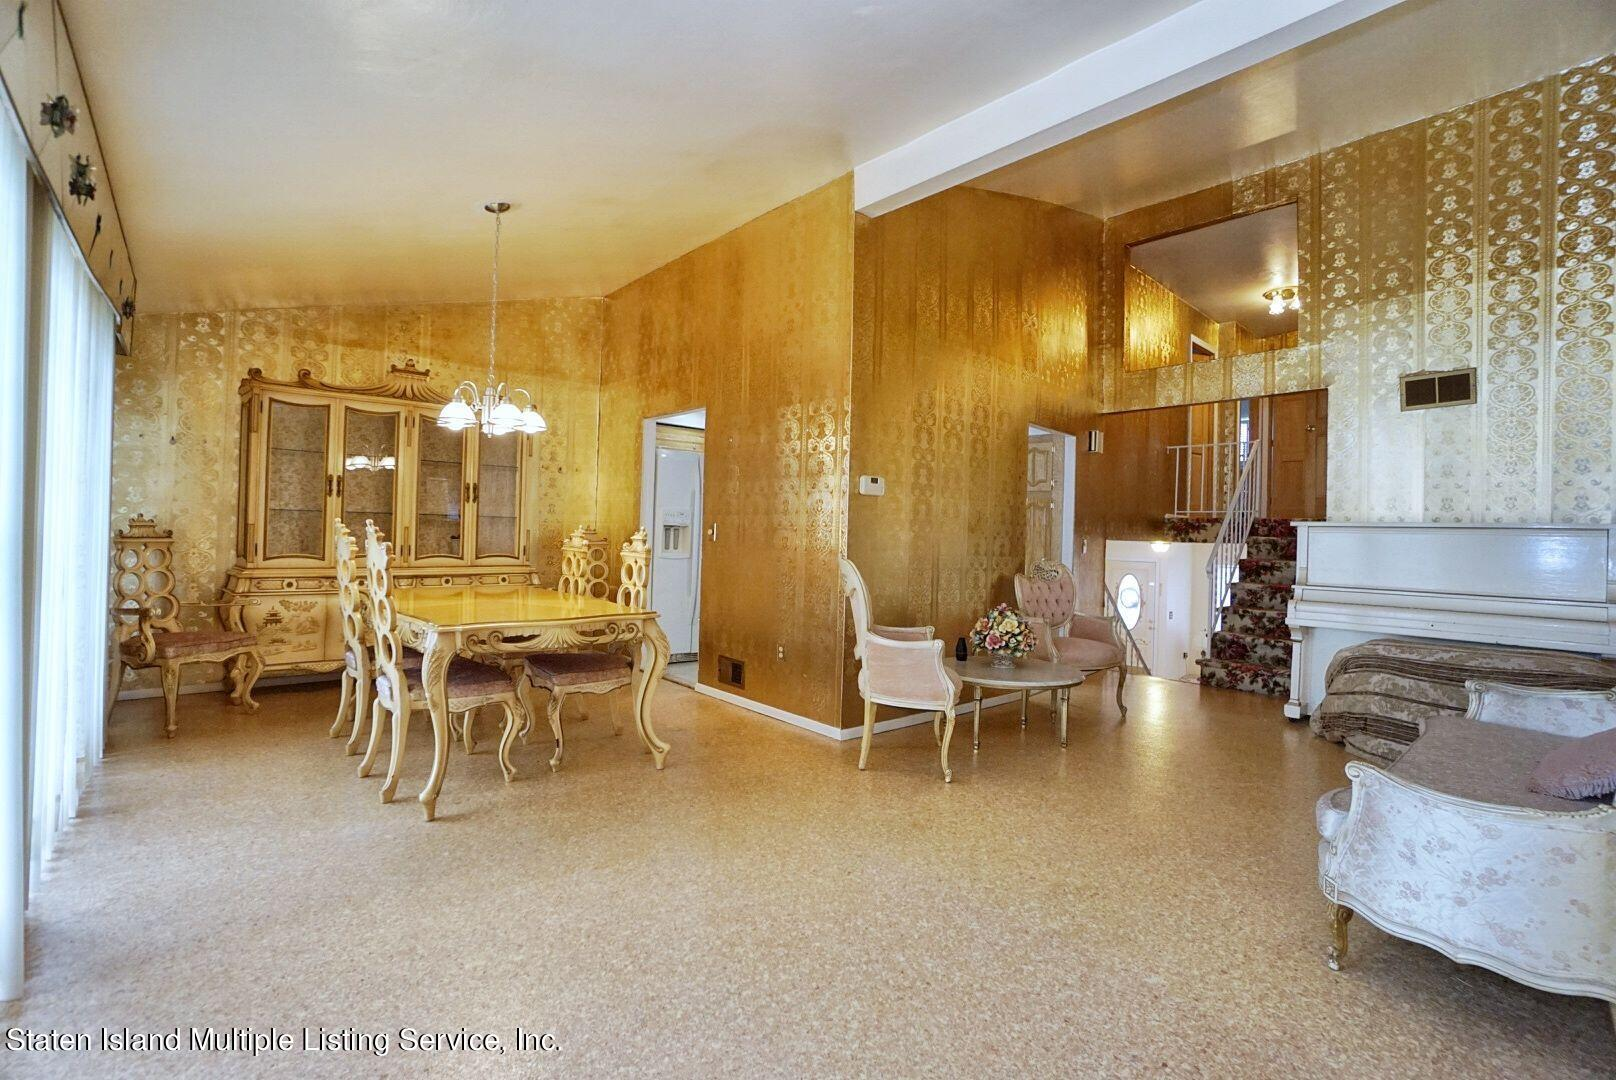 Single Family - Detached 94 Cranford Avenue  Staten Island, NY 10306, MLS-1146620-19